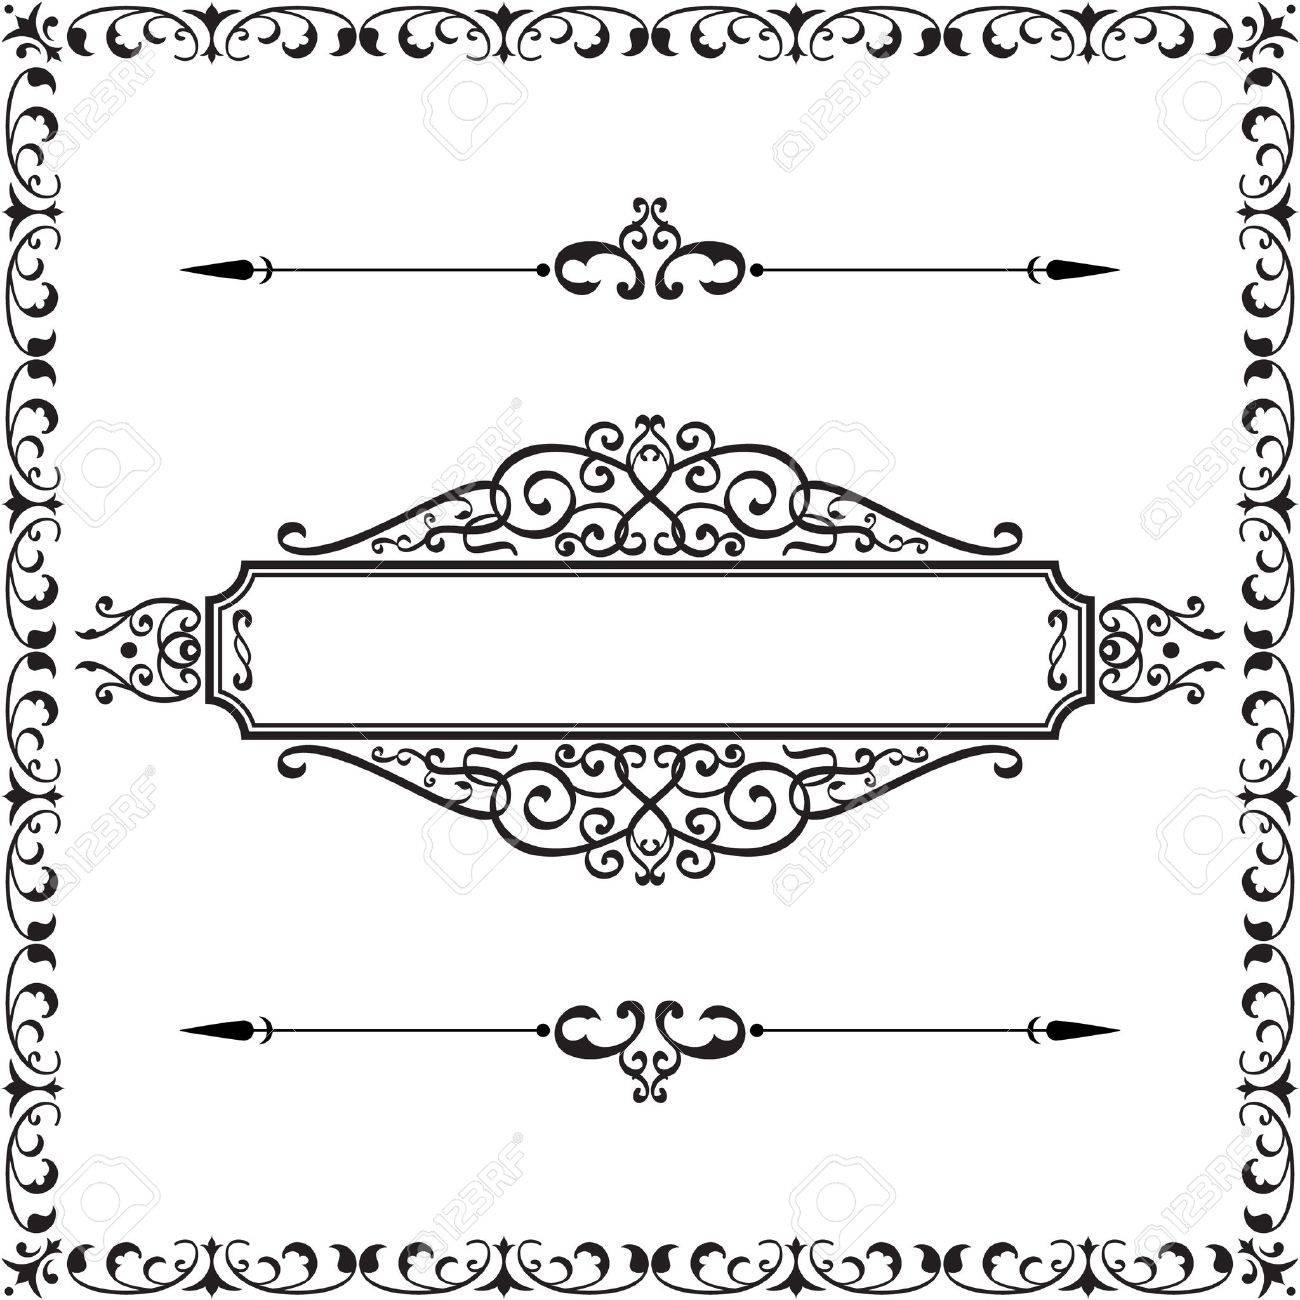 Good lloking border isolated on white Stock Vector - 19109603